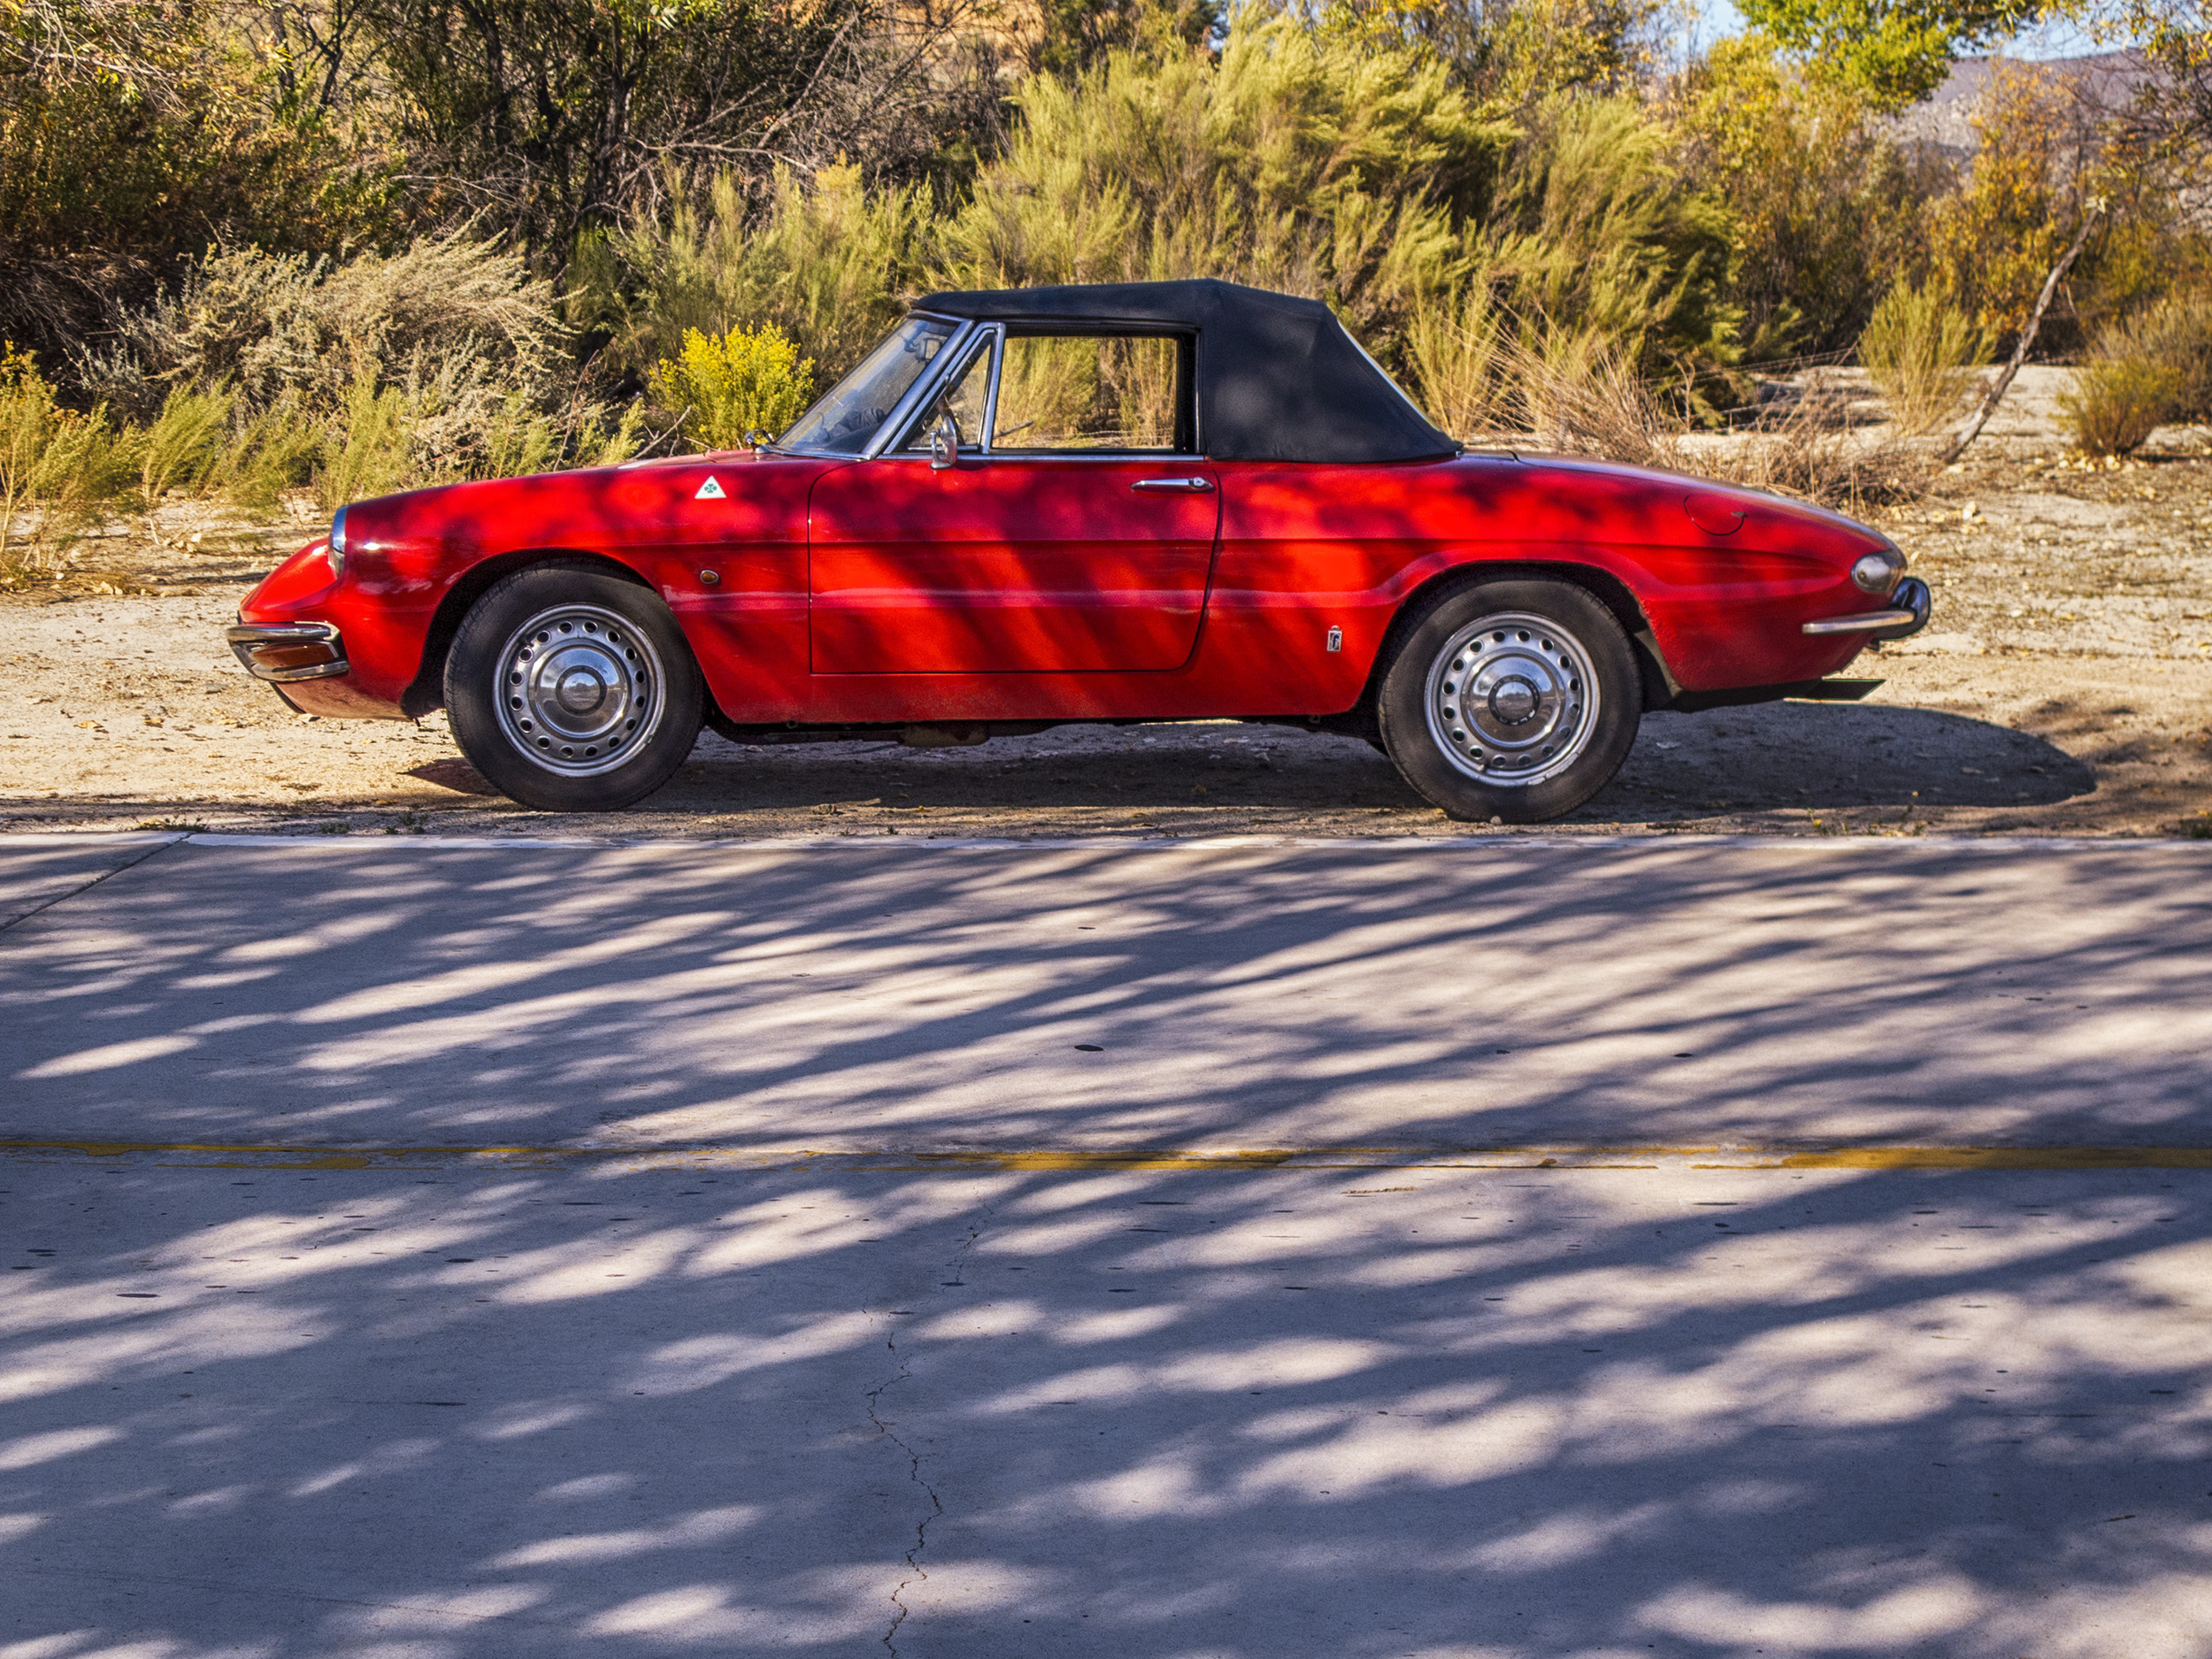 vintage 1967 alfa romeo duetto on roadside profile